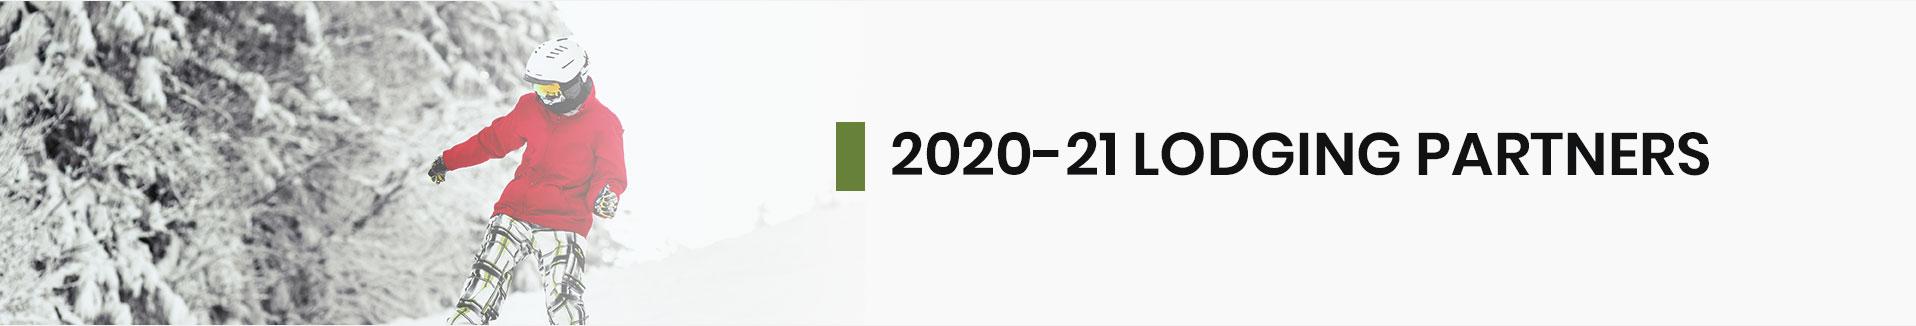 2020-21 Lodging Partners